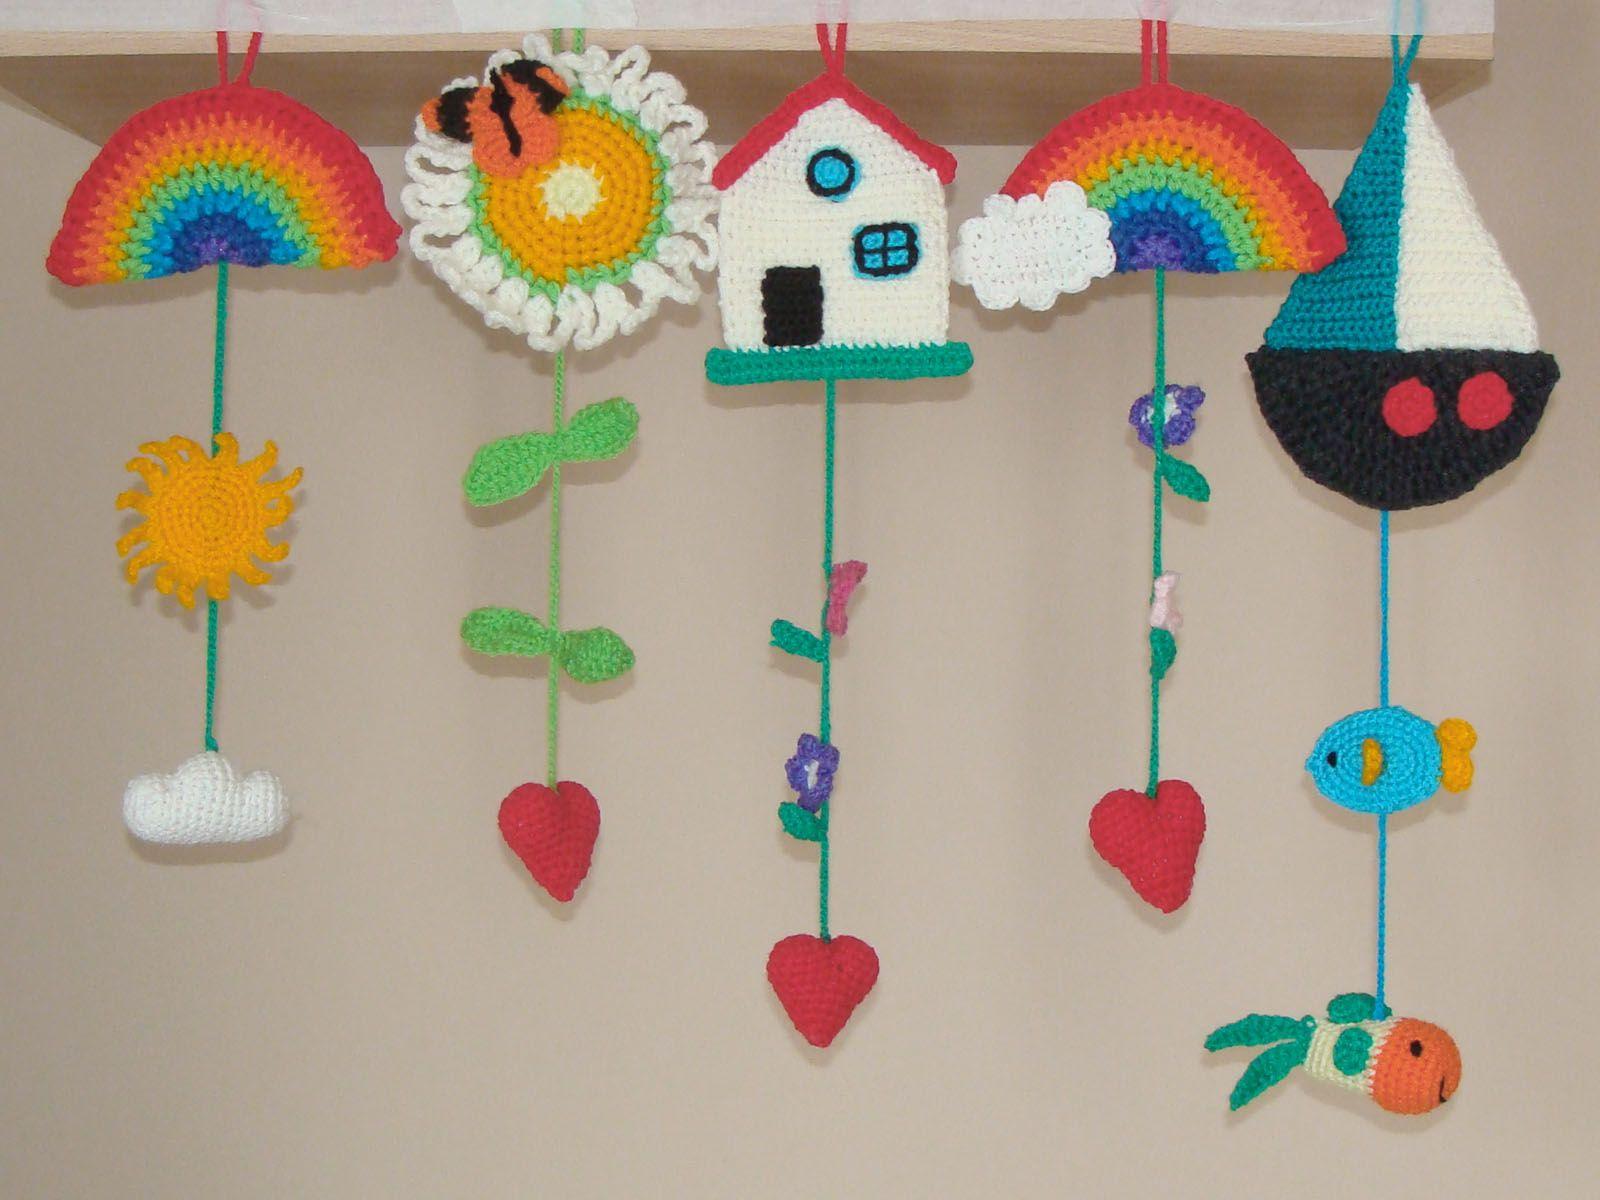 Colgantes   bebek odası süsleri   Pinterest   Colgantes, Tejido y ...